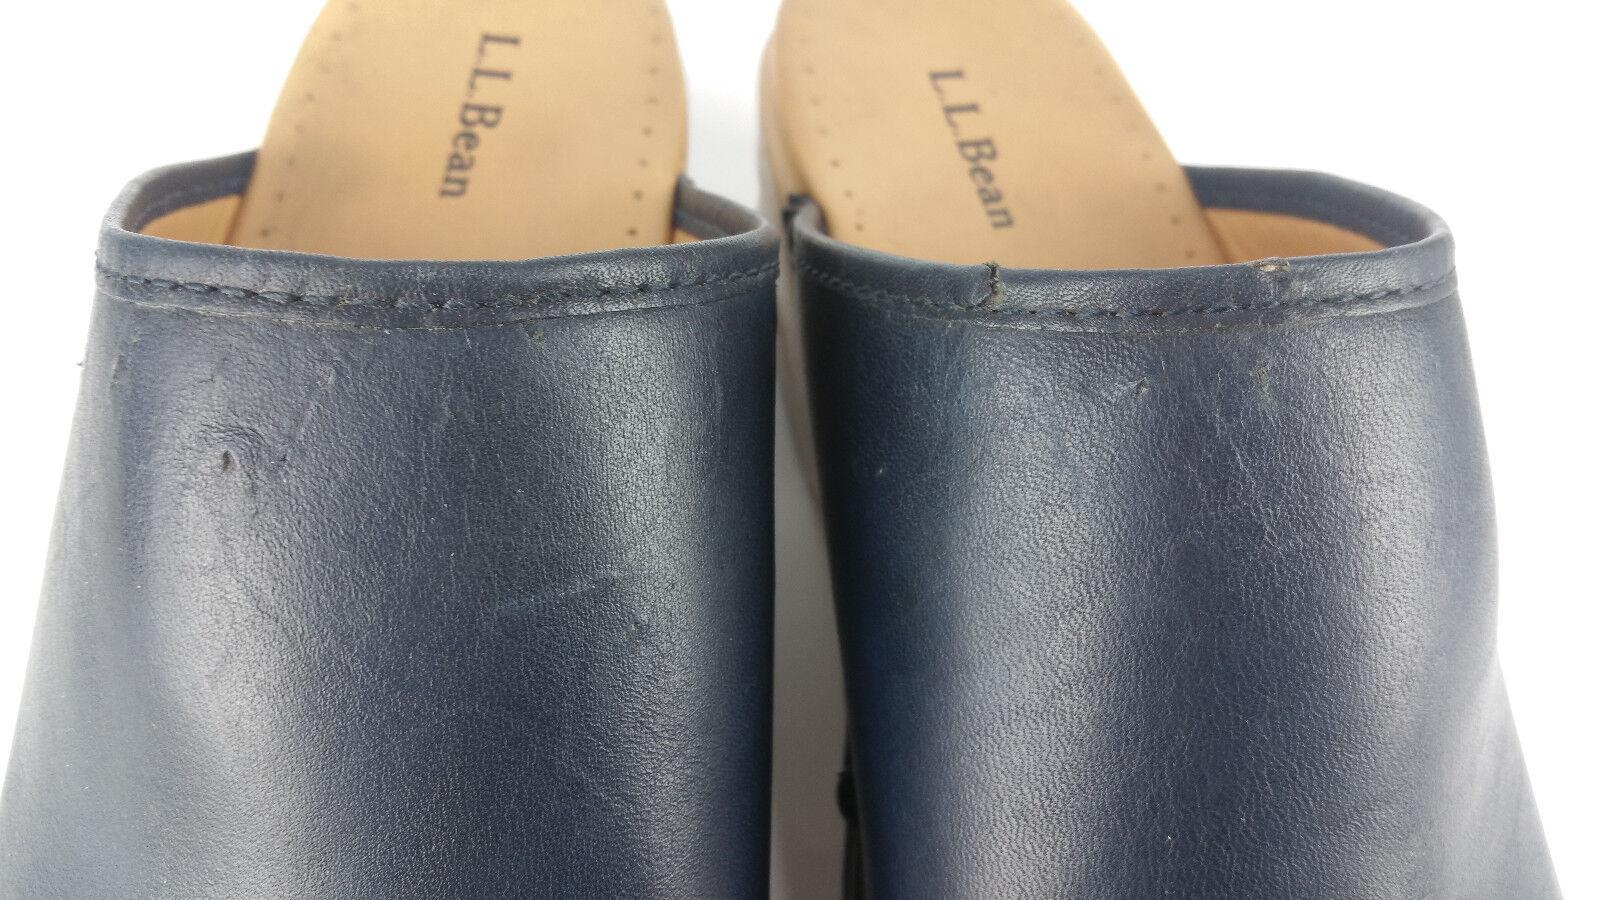 LL Bean Navy Blau Wood Clogs damen 11 M Slipper Slipper Slipper Slip On schuhe Leather Mule 6175 8695f9